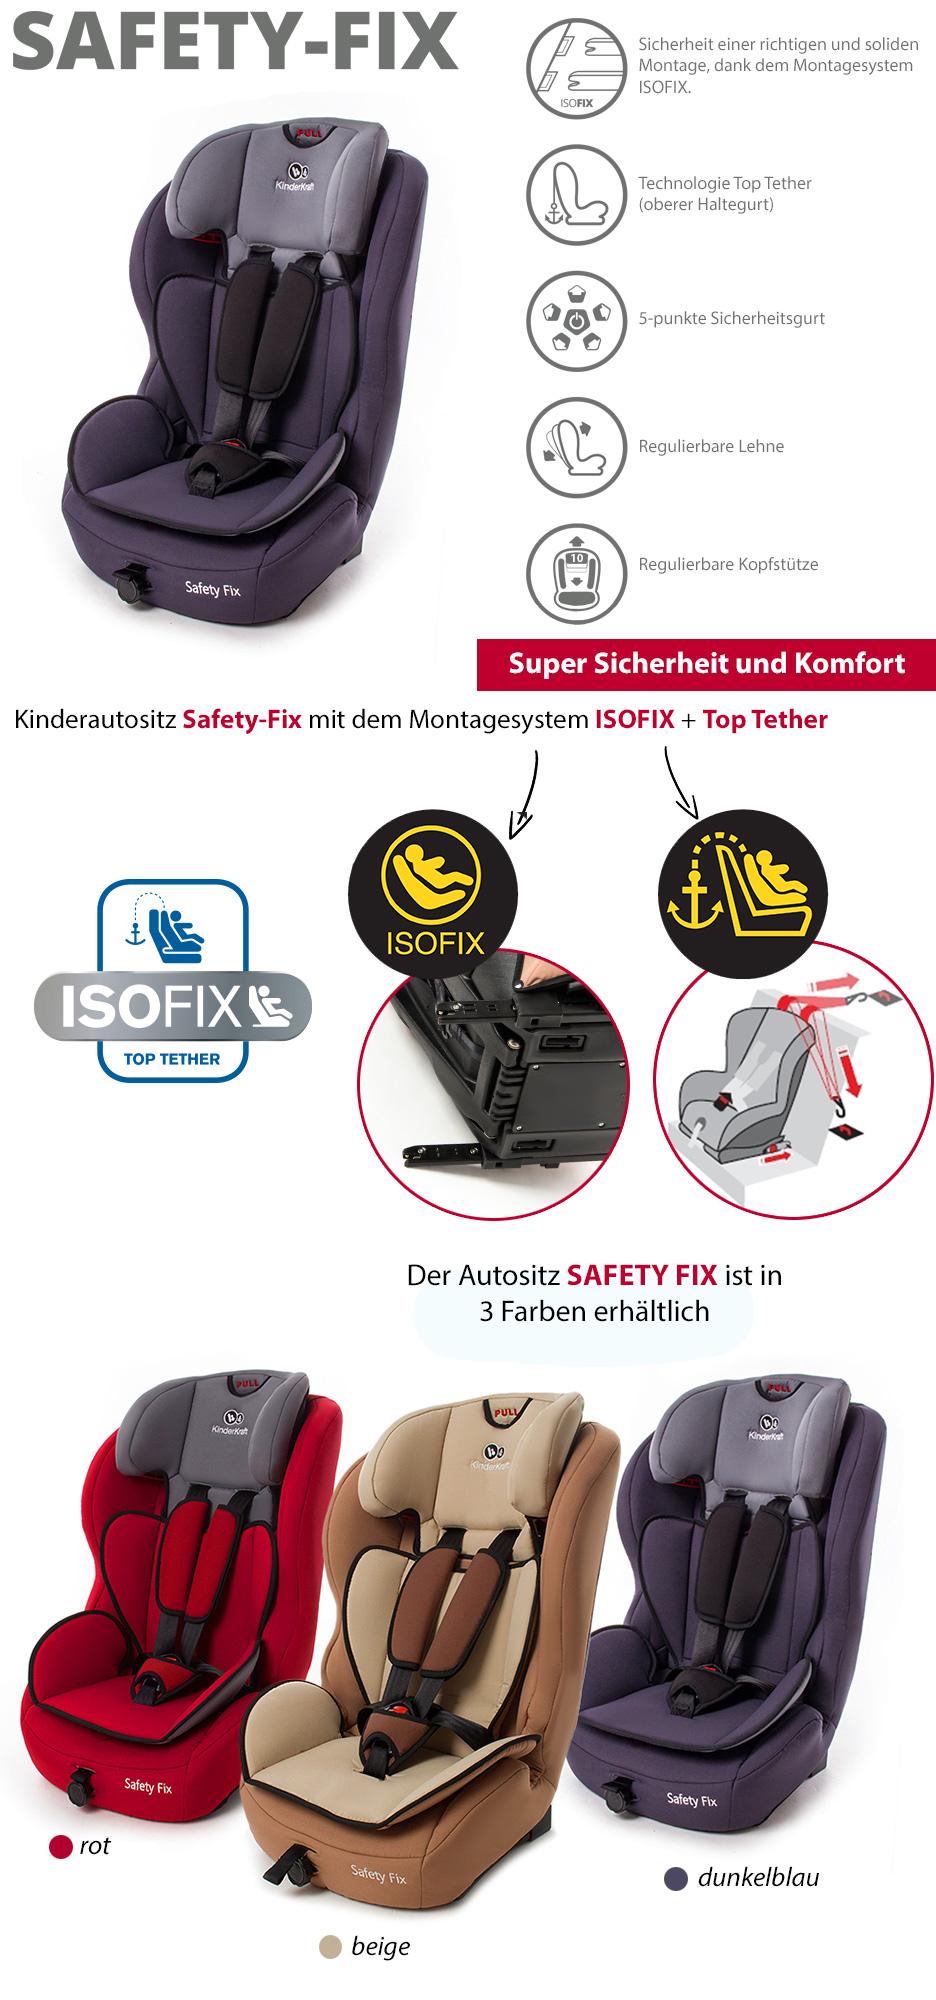 kinderkraft isofix safety fix kinderautositz 9 36kg beige 5 punkte autositz ebay. Black Bedroom Furniture Sets. Home Design Ideas